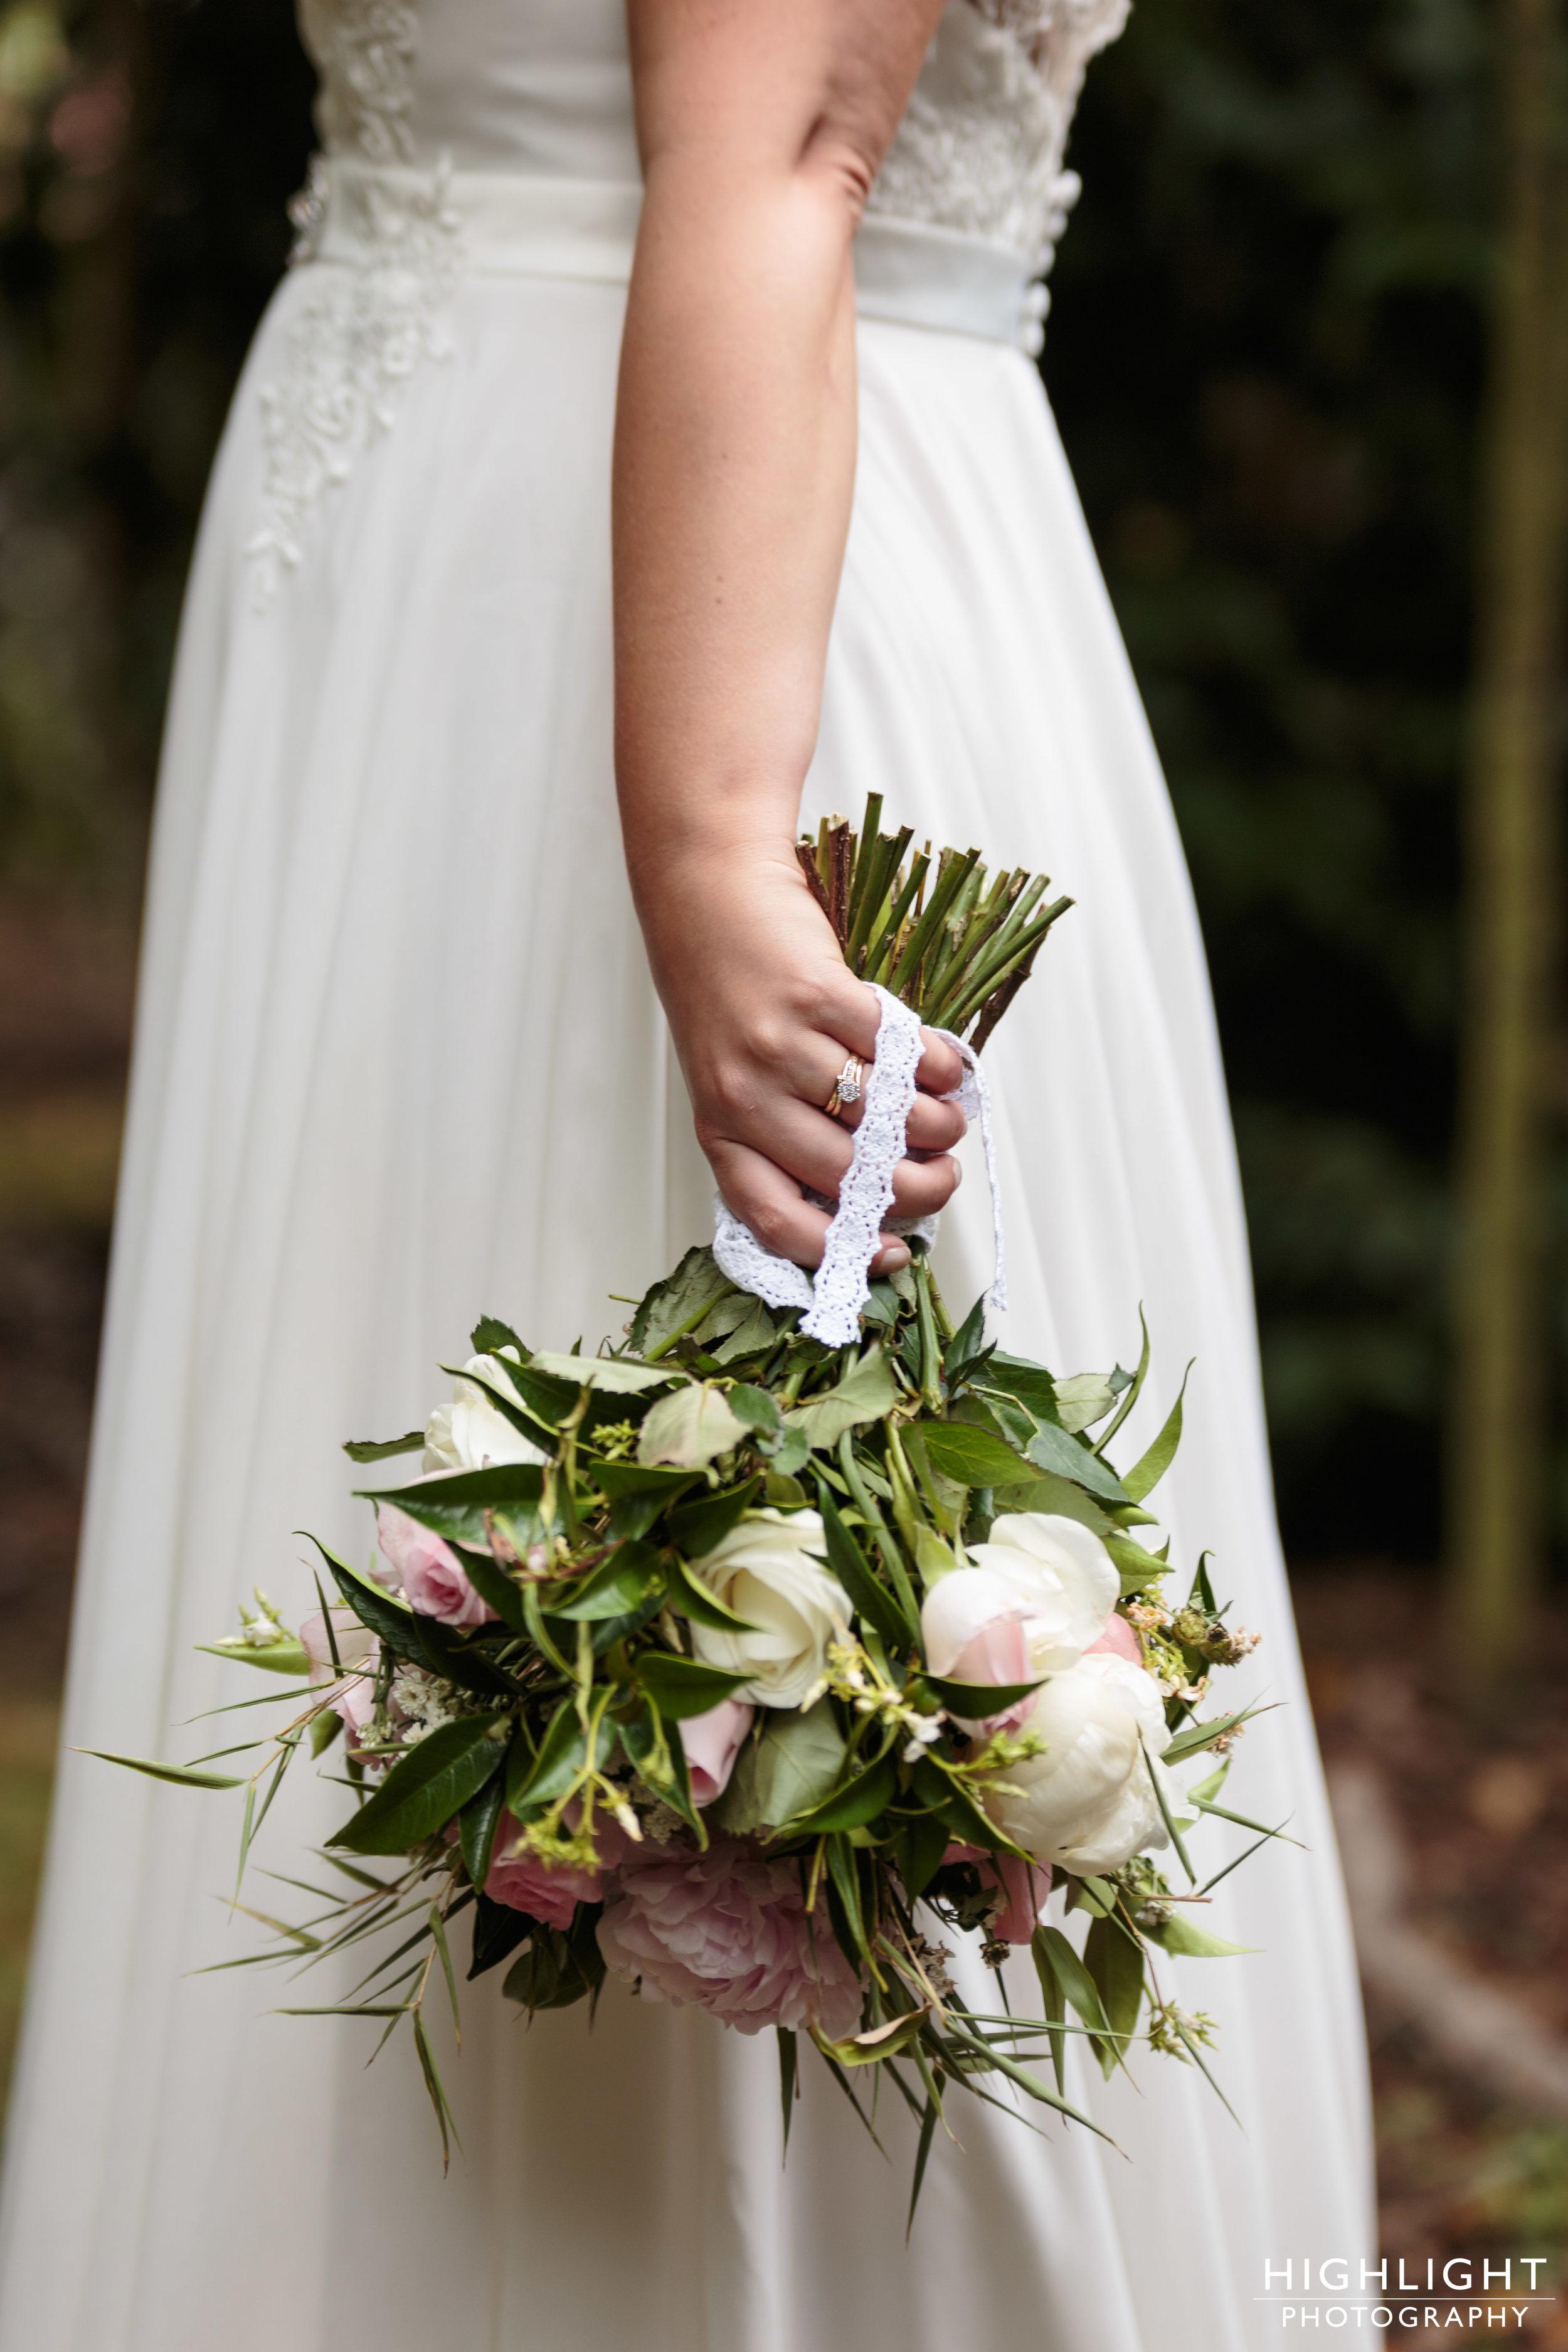 JM-2017-Highlight-wedding-photography-palmerston-north-new-zealand-140.jpg